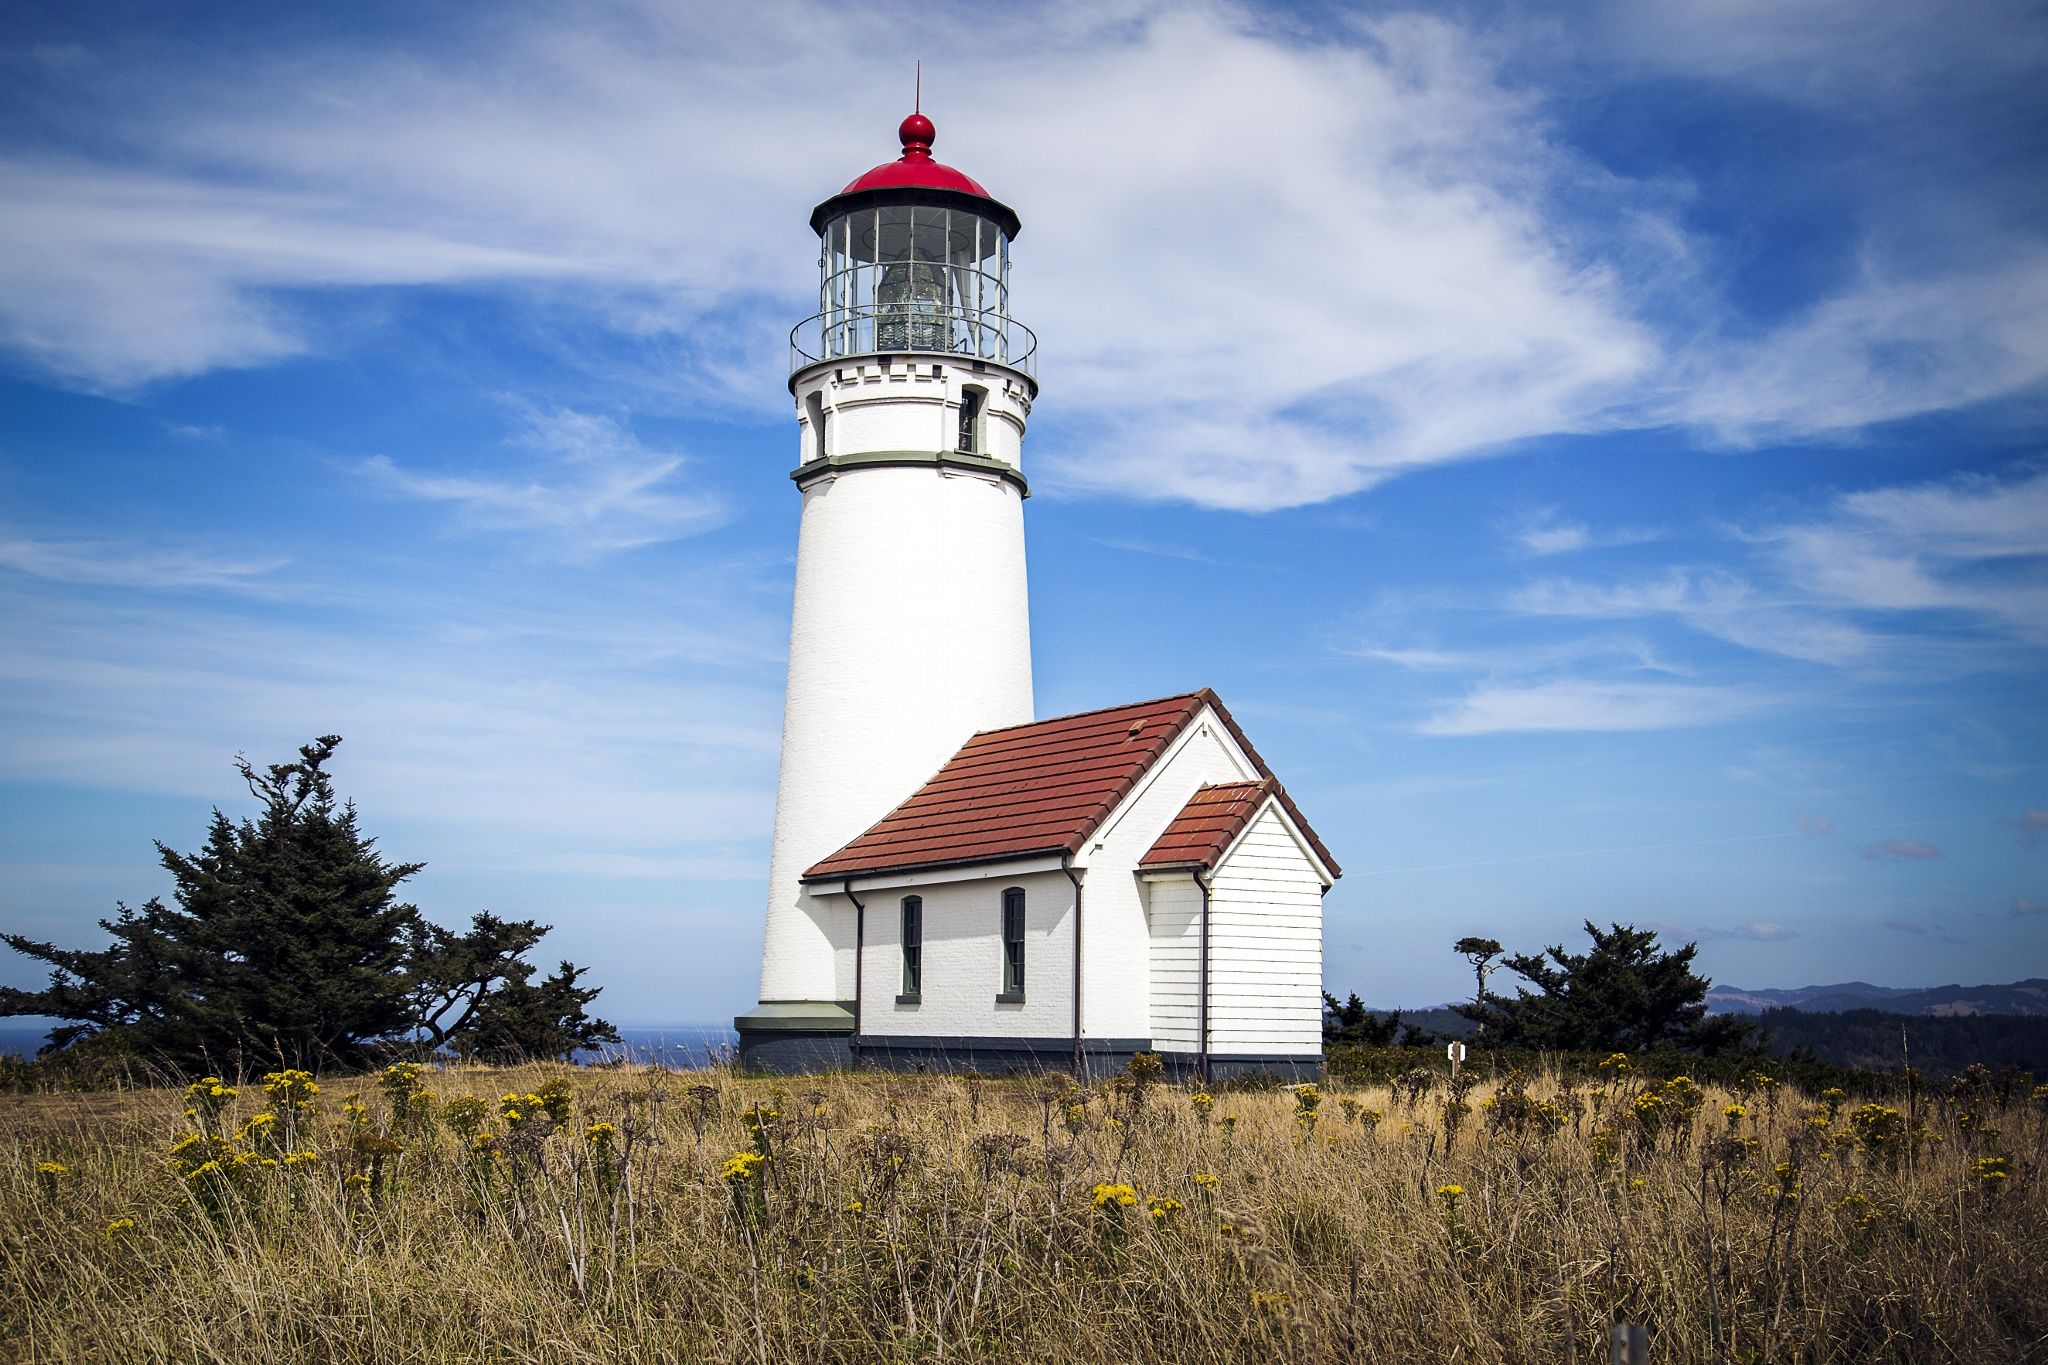 Photograph Cape Blanco Lighthouse. by Michael Kinnaman on 500px